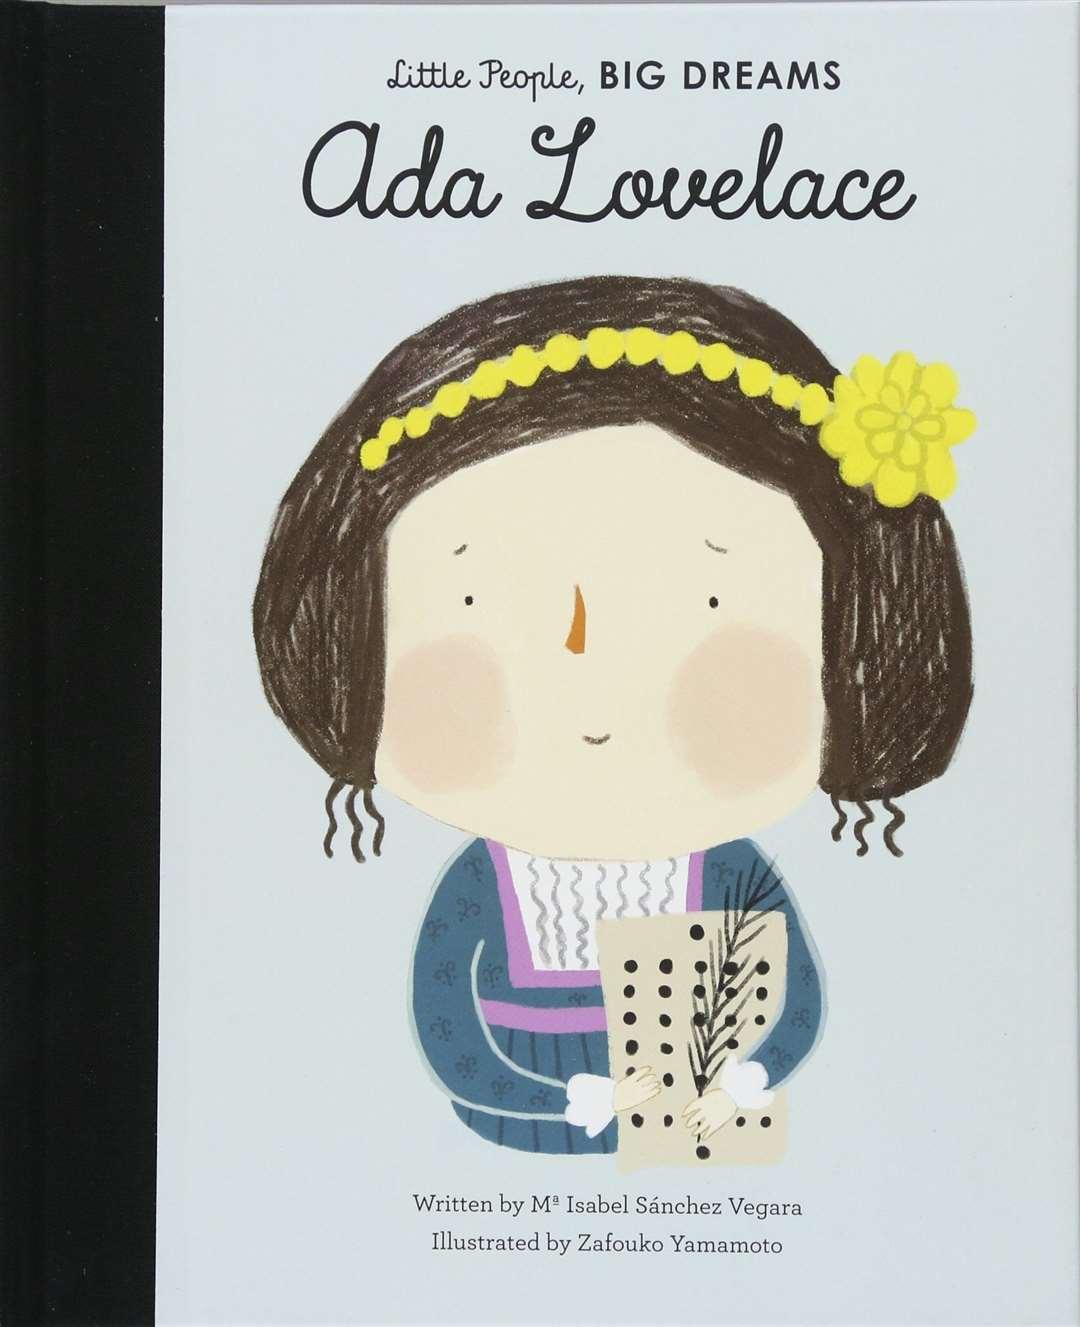 Ada Lovelace - Little People, BIG DREAMS par Isabel Sanchez Vegara et Zafouko Yamamoto (43297301)